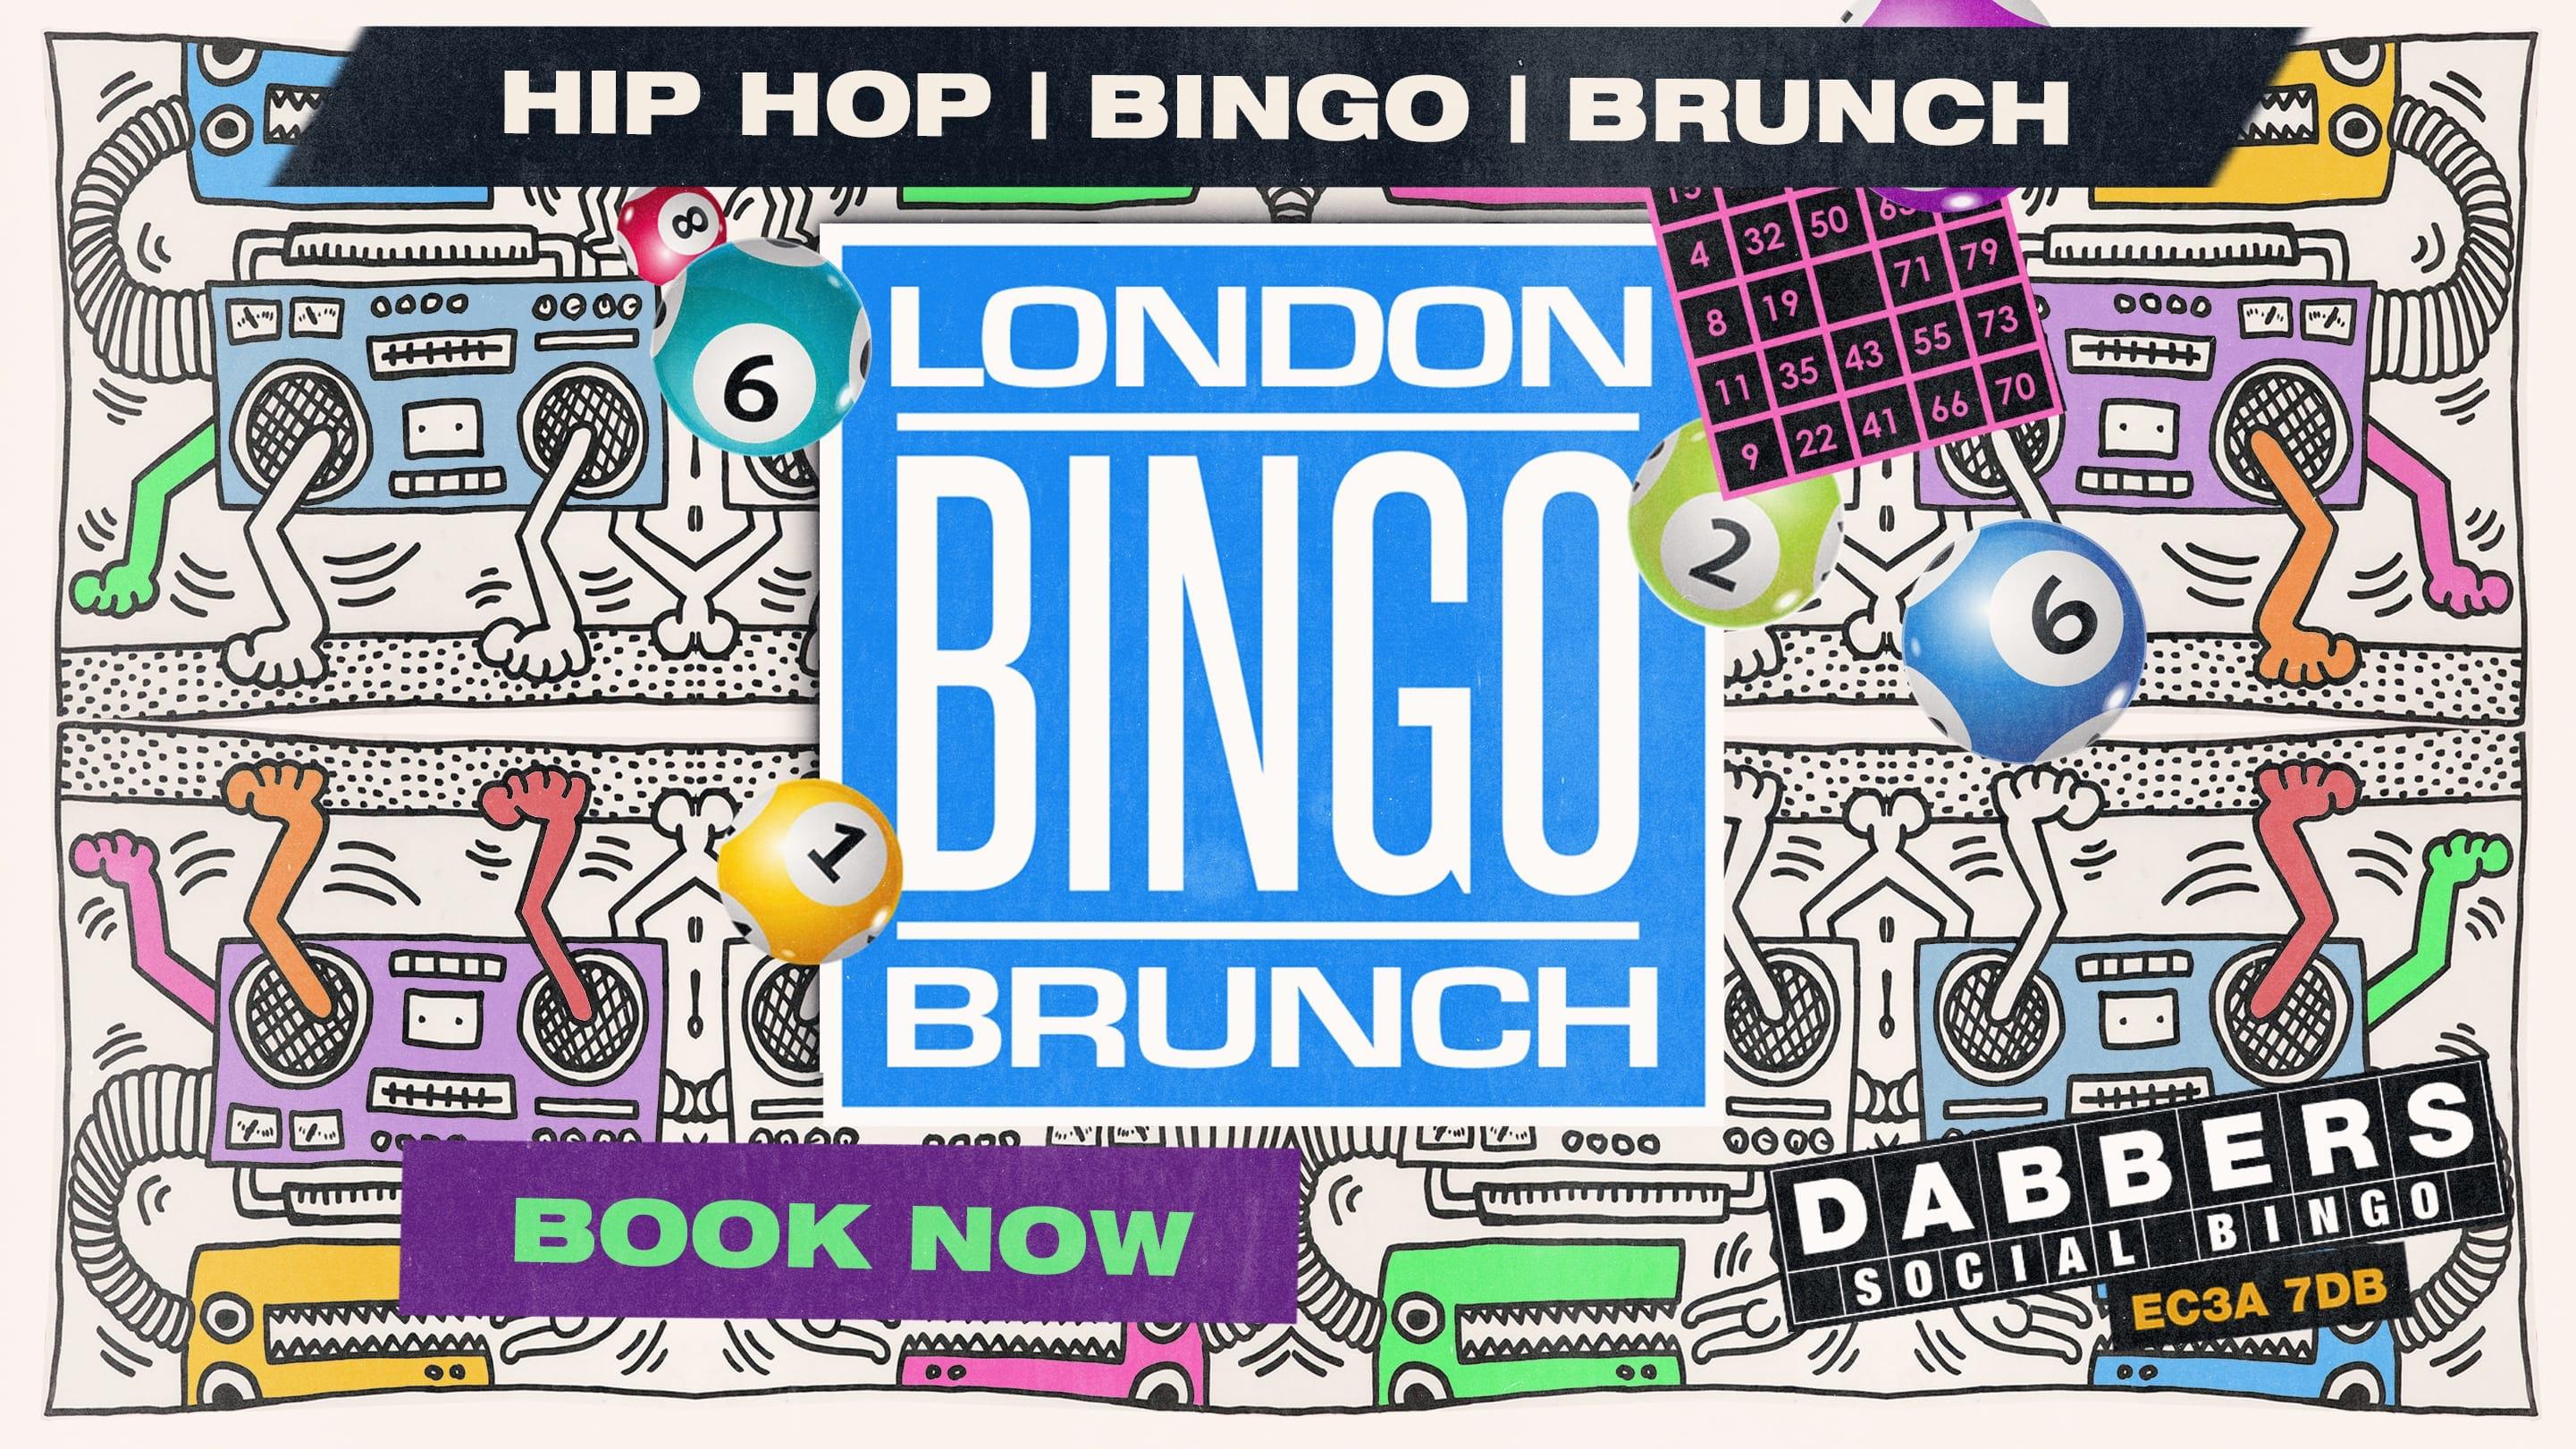 London Bingo Brunch: All Day Hip Hip Bangers